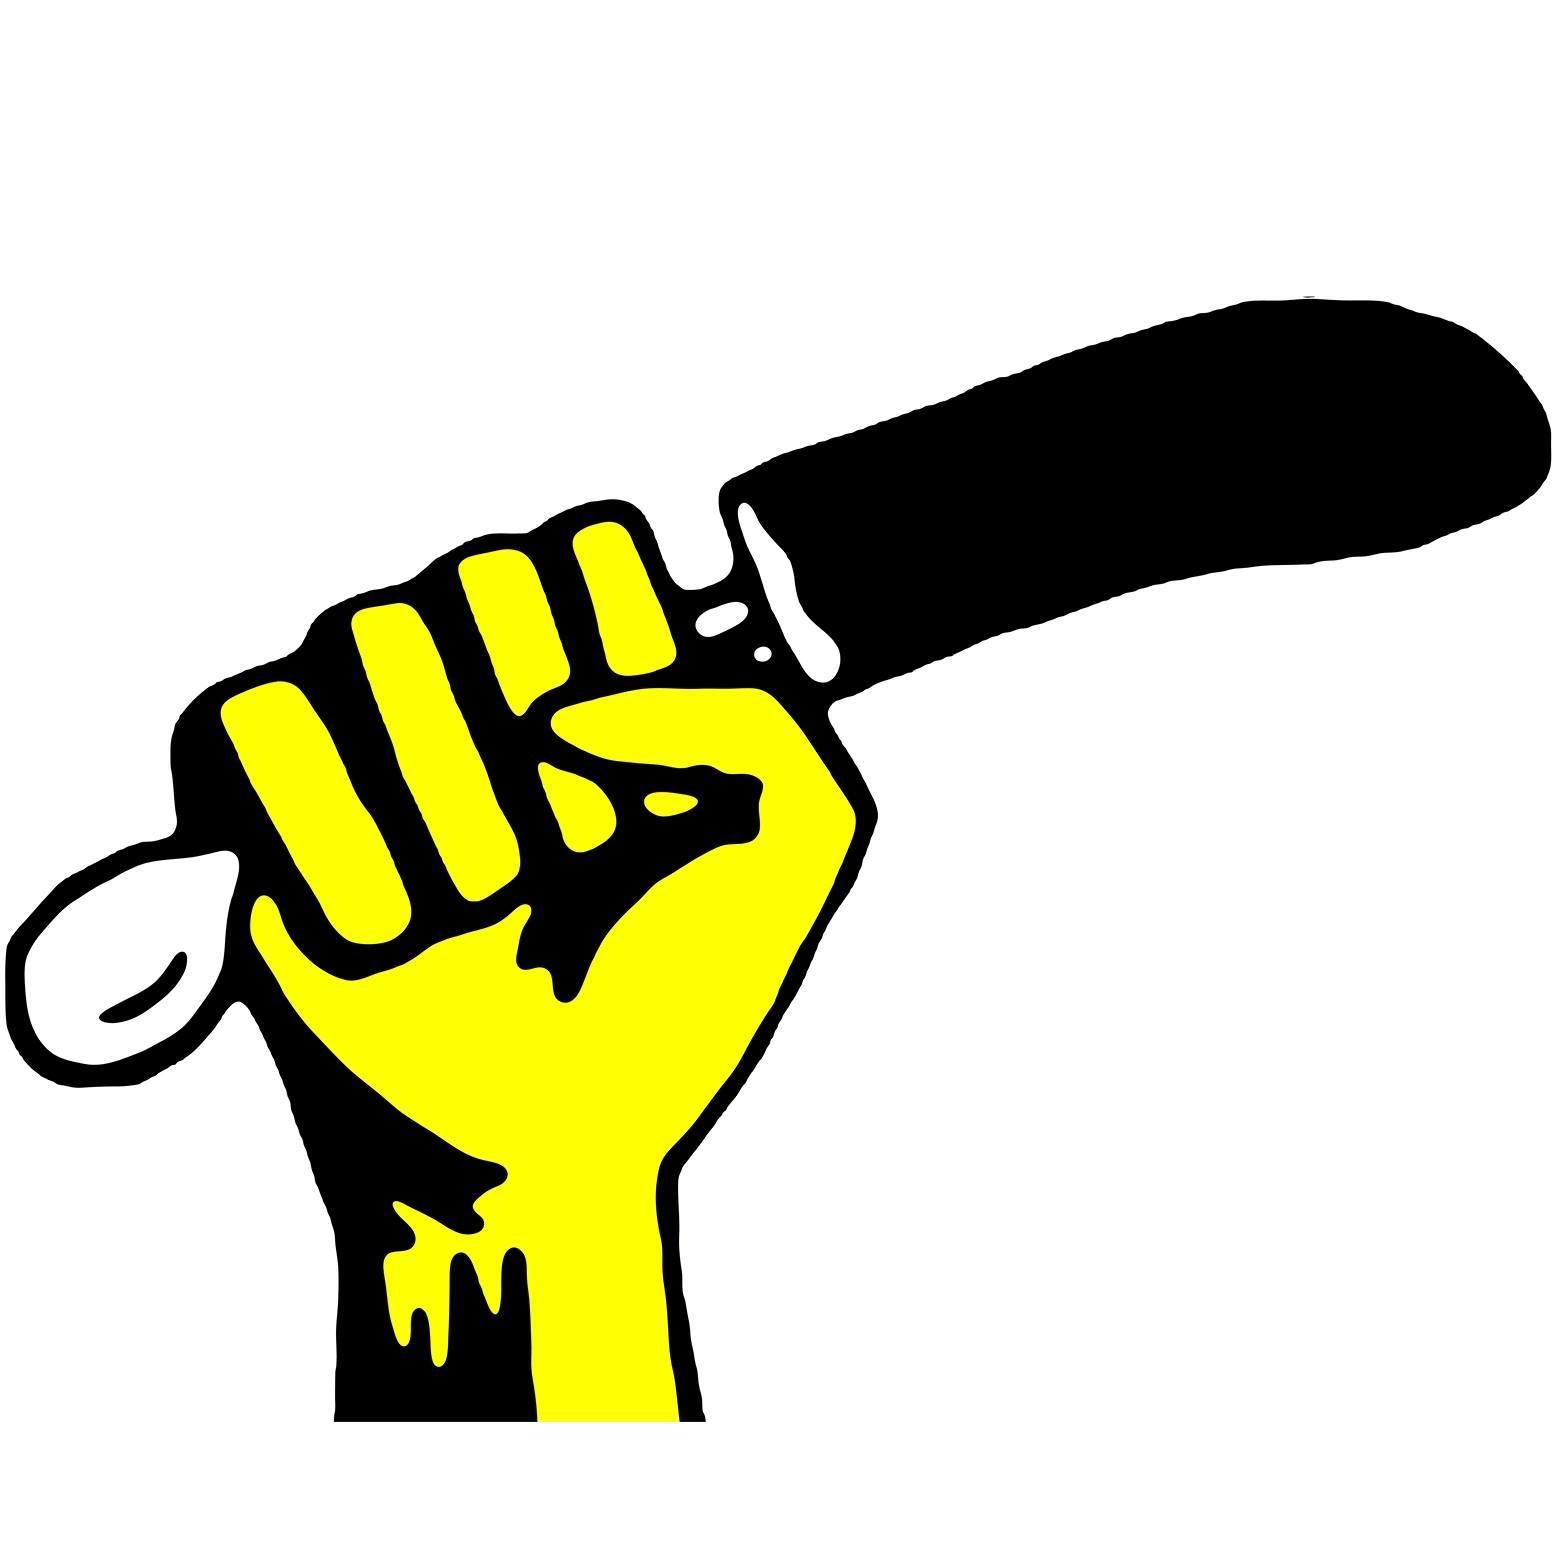 Bananarchy logo